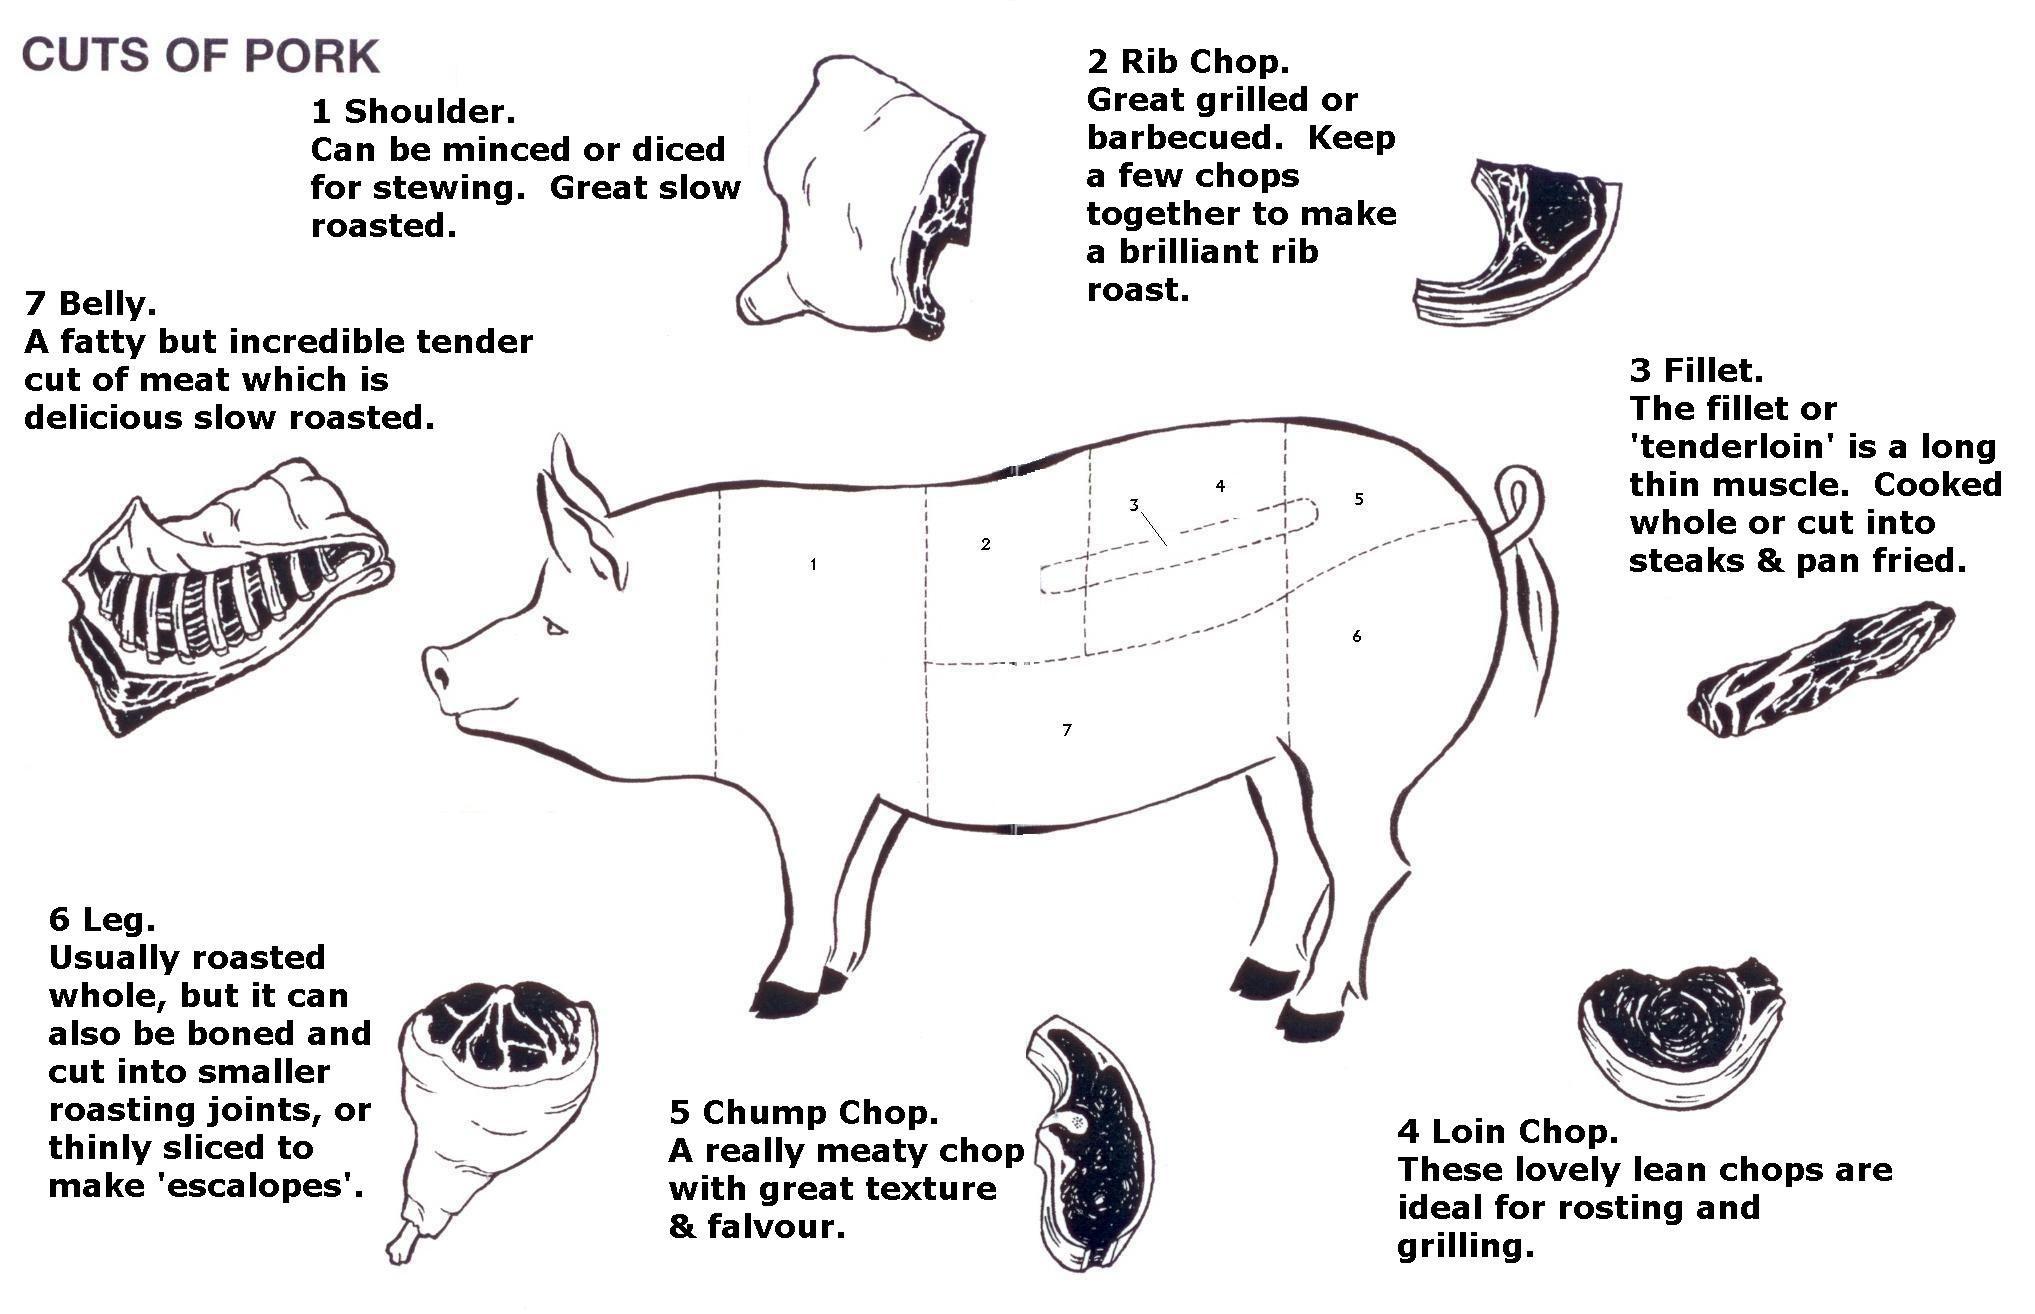 Diagram of cuts of pork. Photo courtesy of: http://beechtreefarm ...